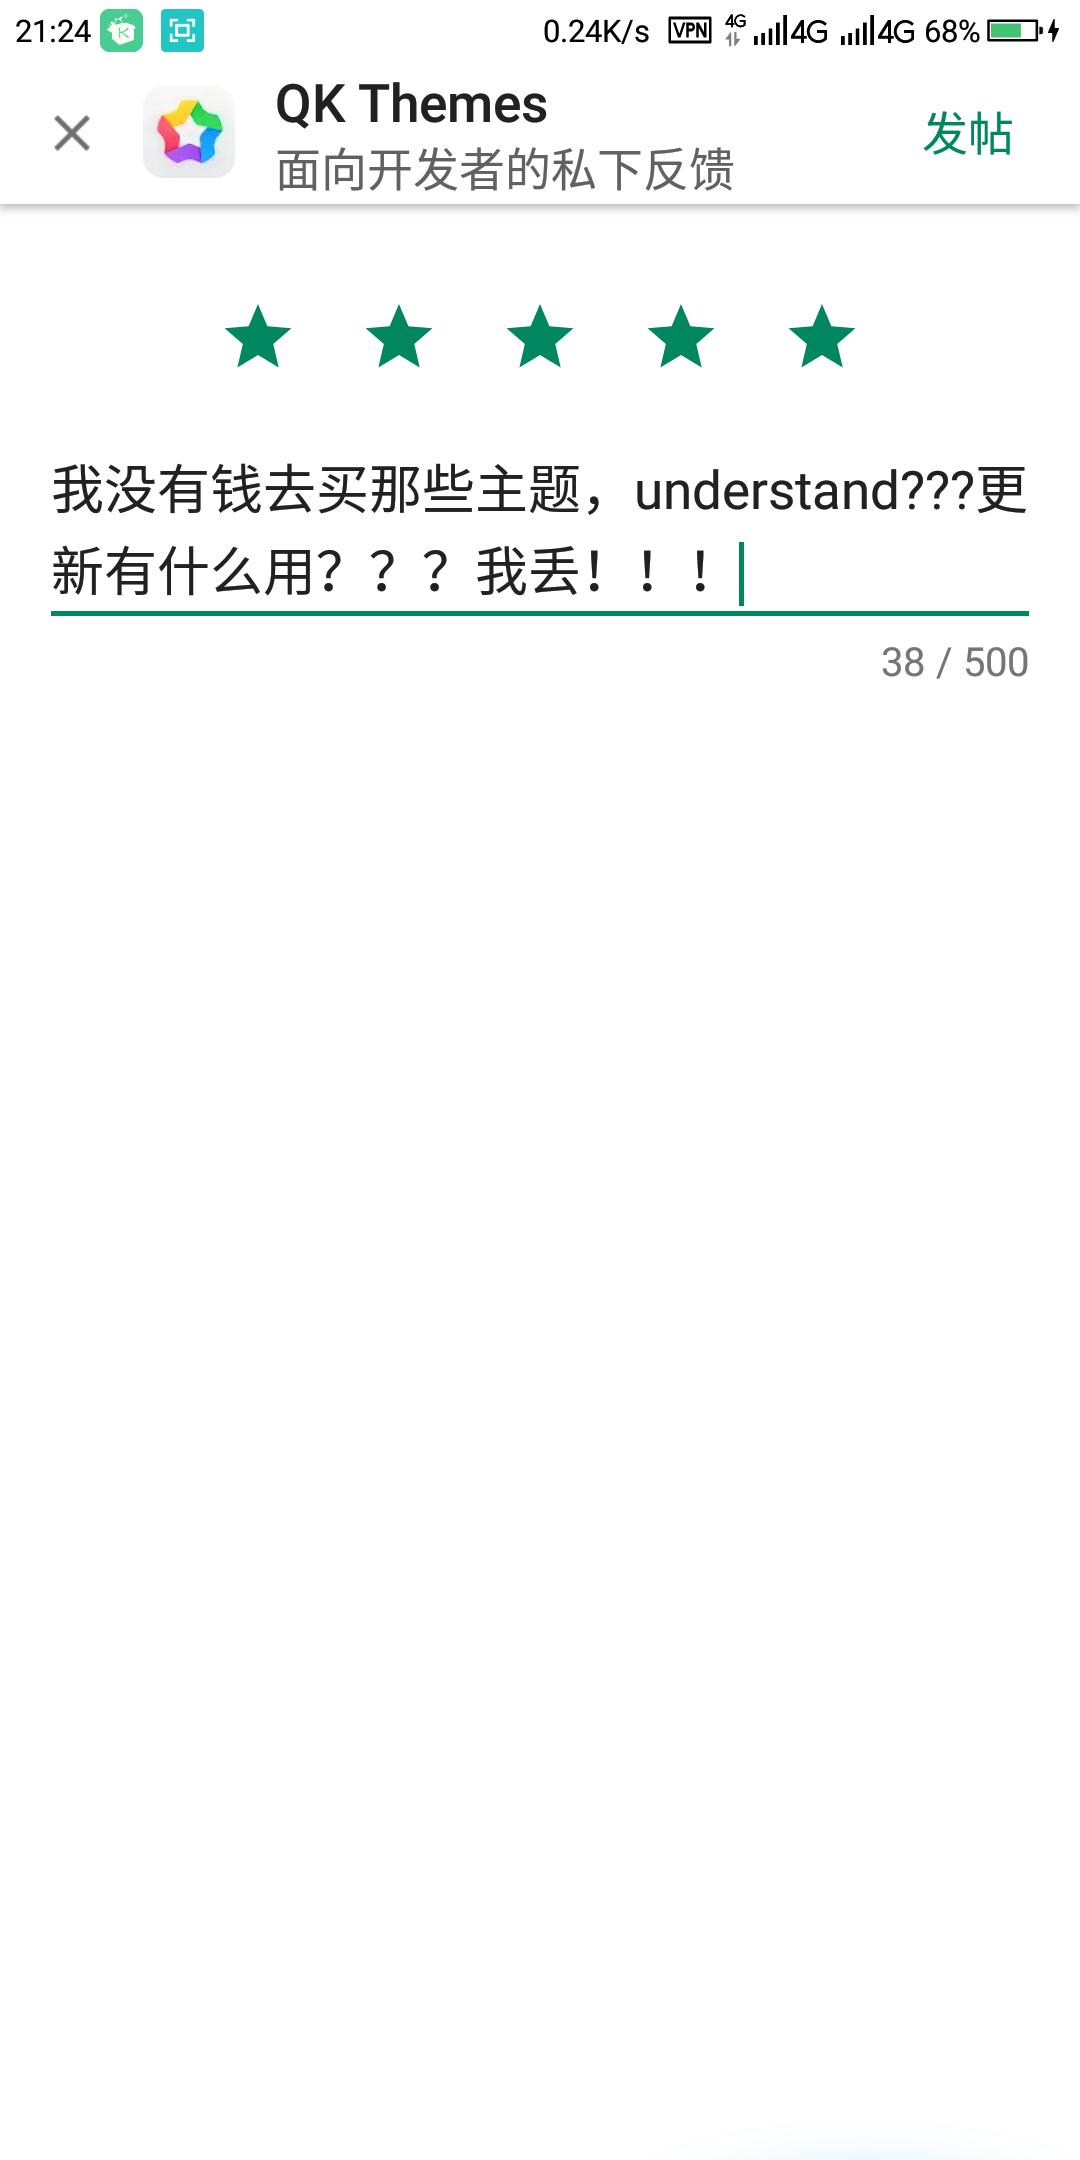 Screenshot_2019-03-16-21-24-03.png